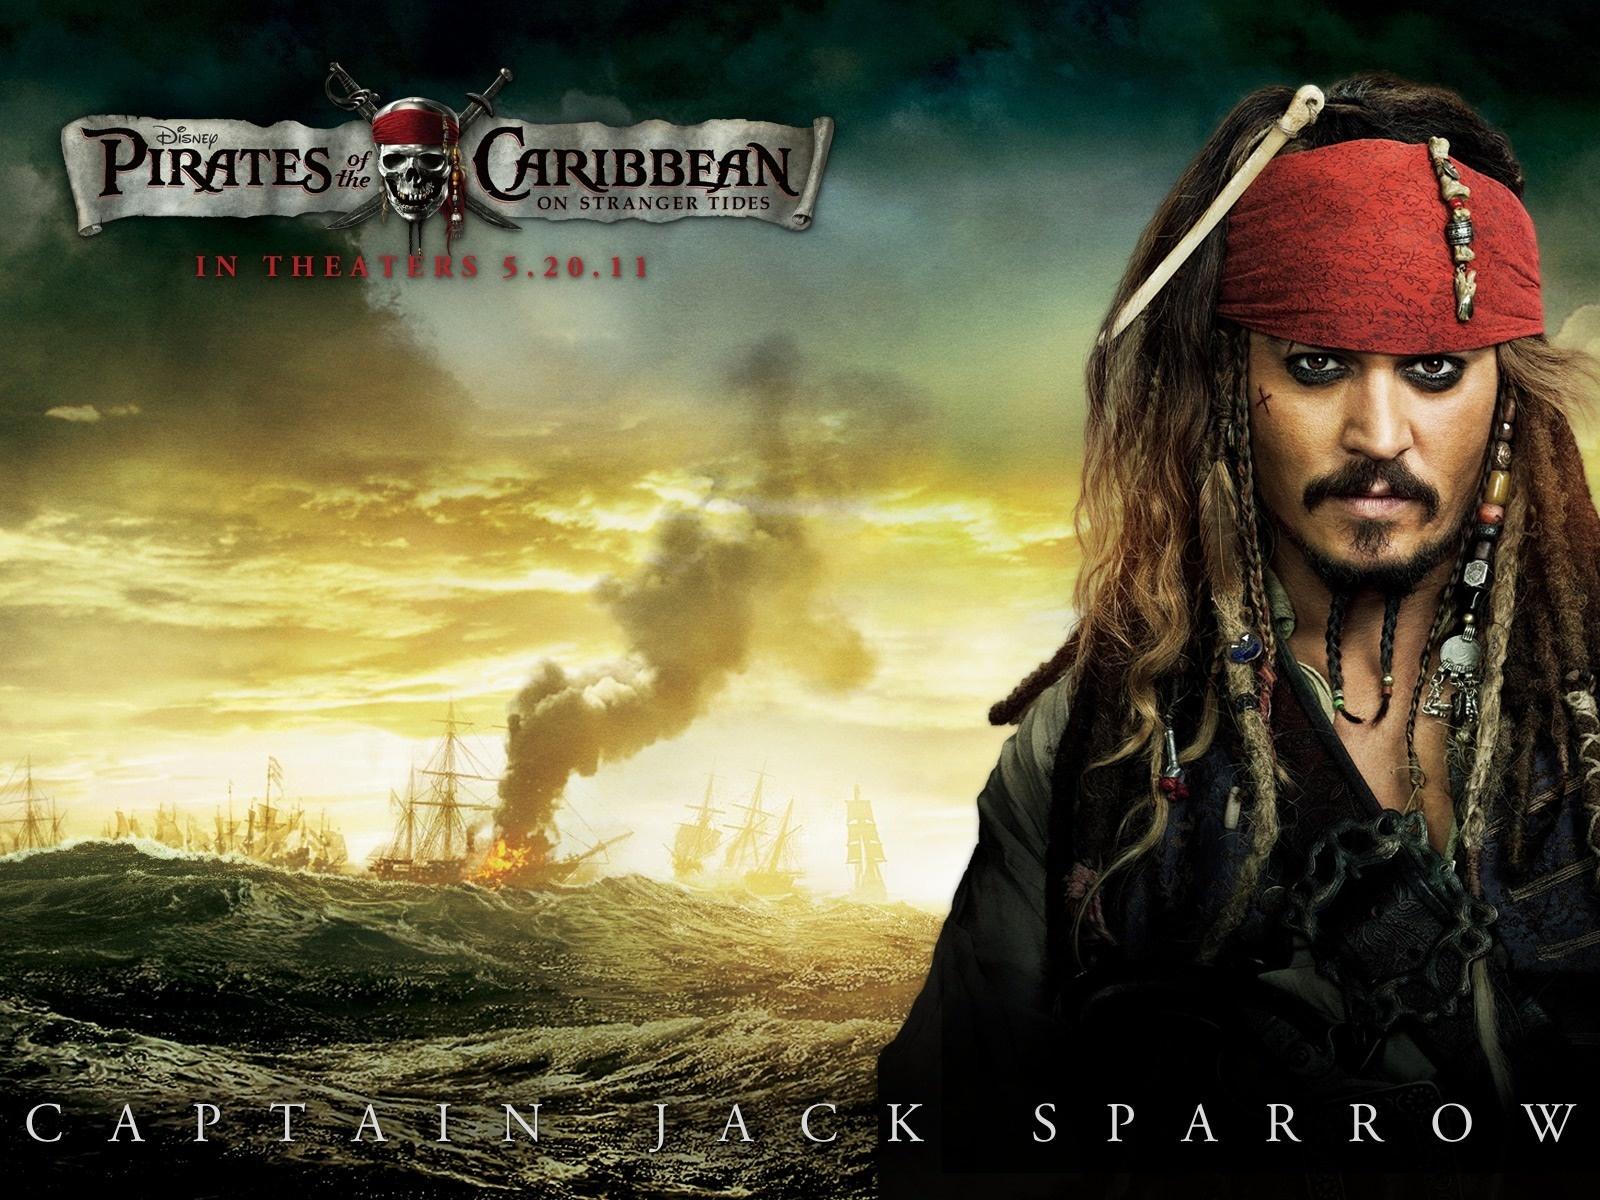 http://4.bp.blogspot.com/-B7ts02BOc4A/TZbwkbNS_PI/AAAAAAAADCs/UOrutsUxNHc/s1600/captain%252Bjack%252Bsparrow-Pirates%252Bof%252Bthe%252BCaribbean%252BOn%252BStranger%252BTides-wallpaper%252Bpictselcom.jpg